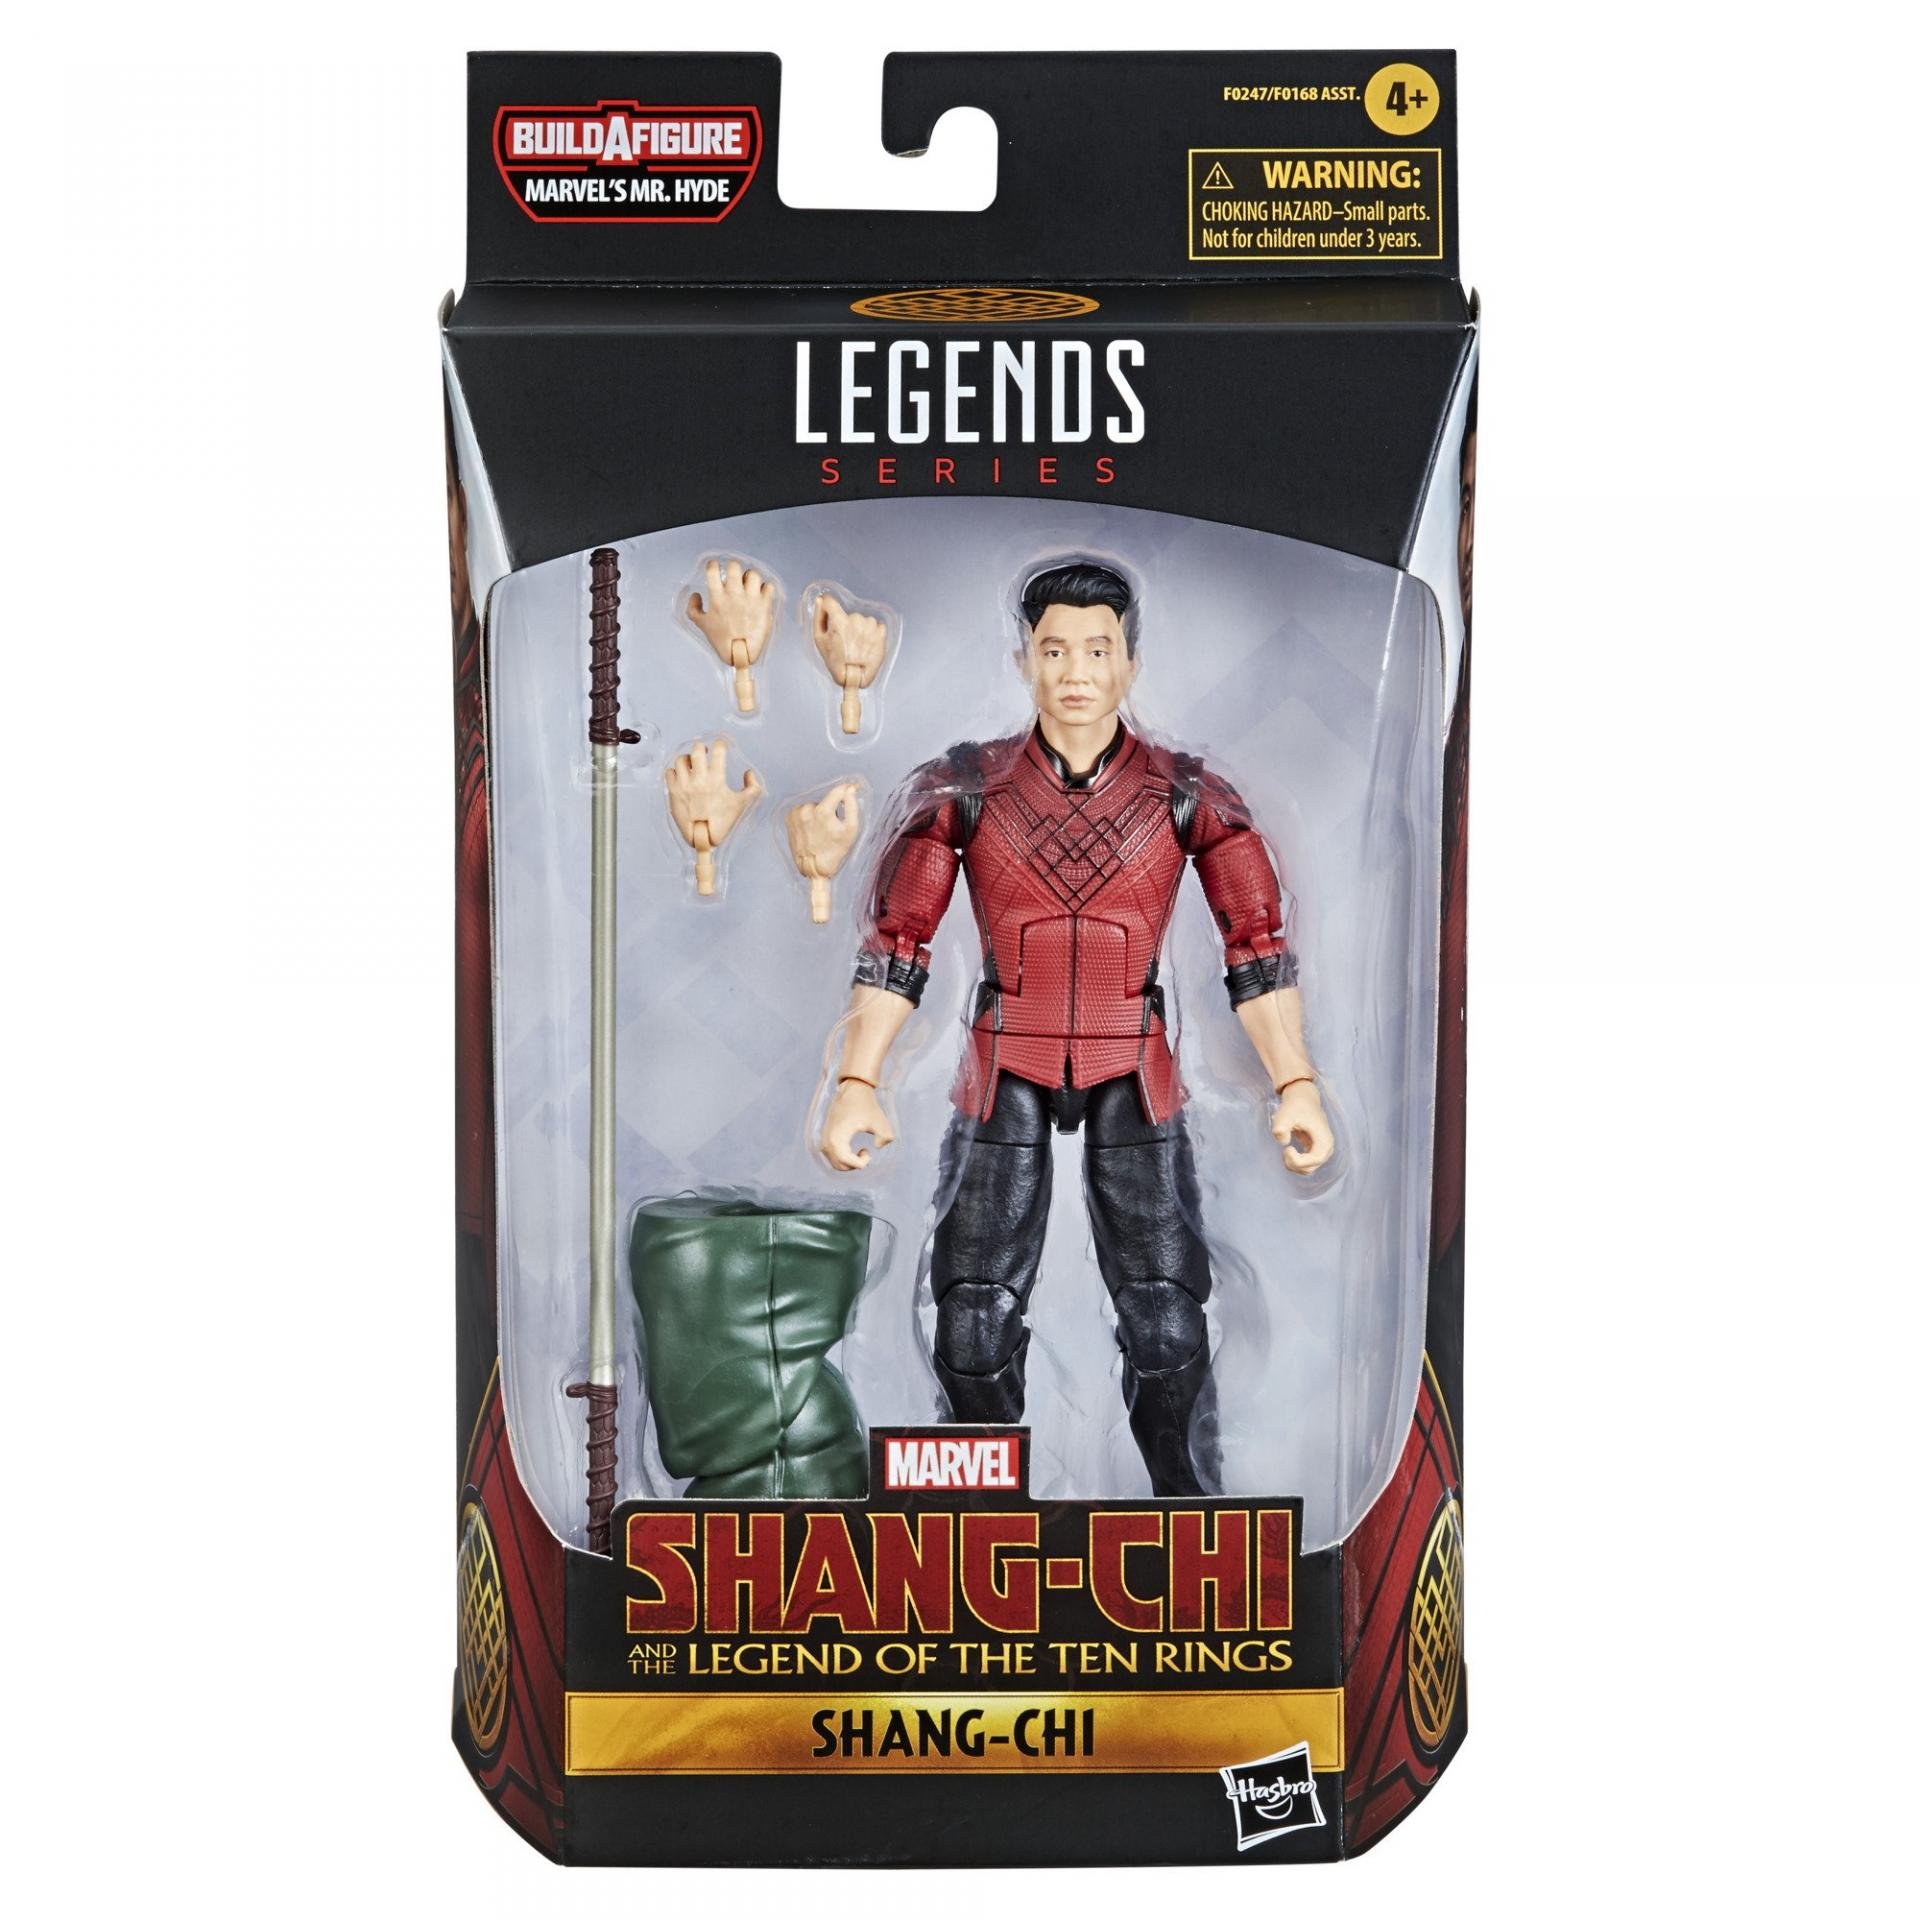 Marvel legends series hasbro shang chi legend of ten rings shang chi